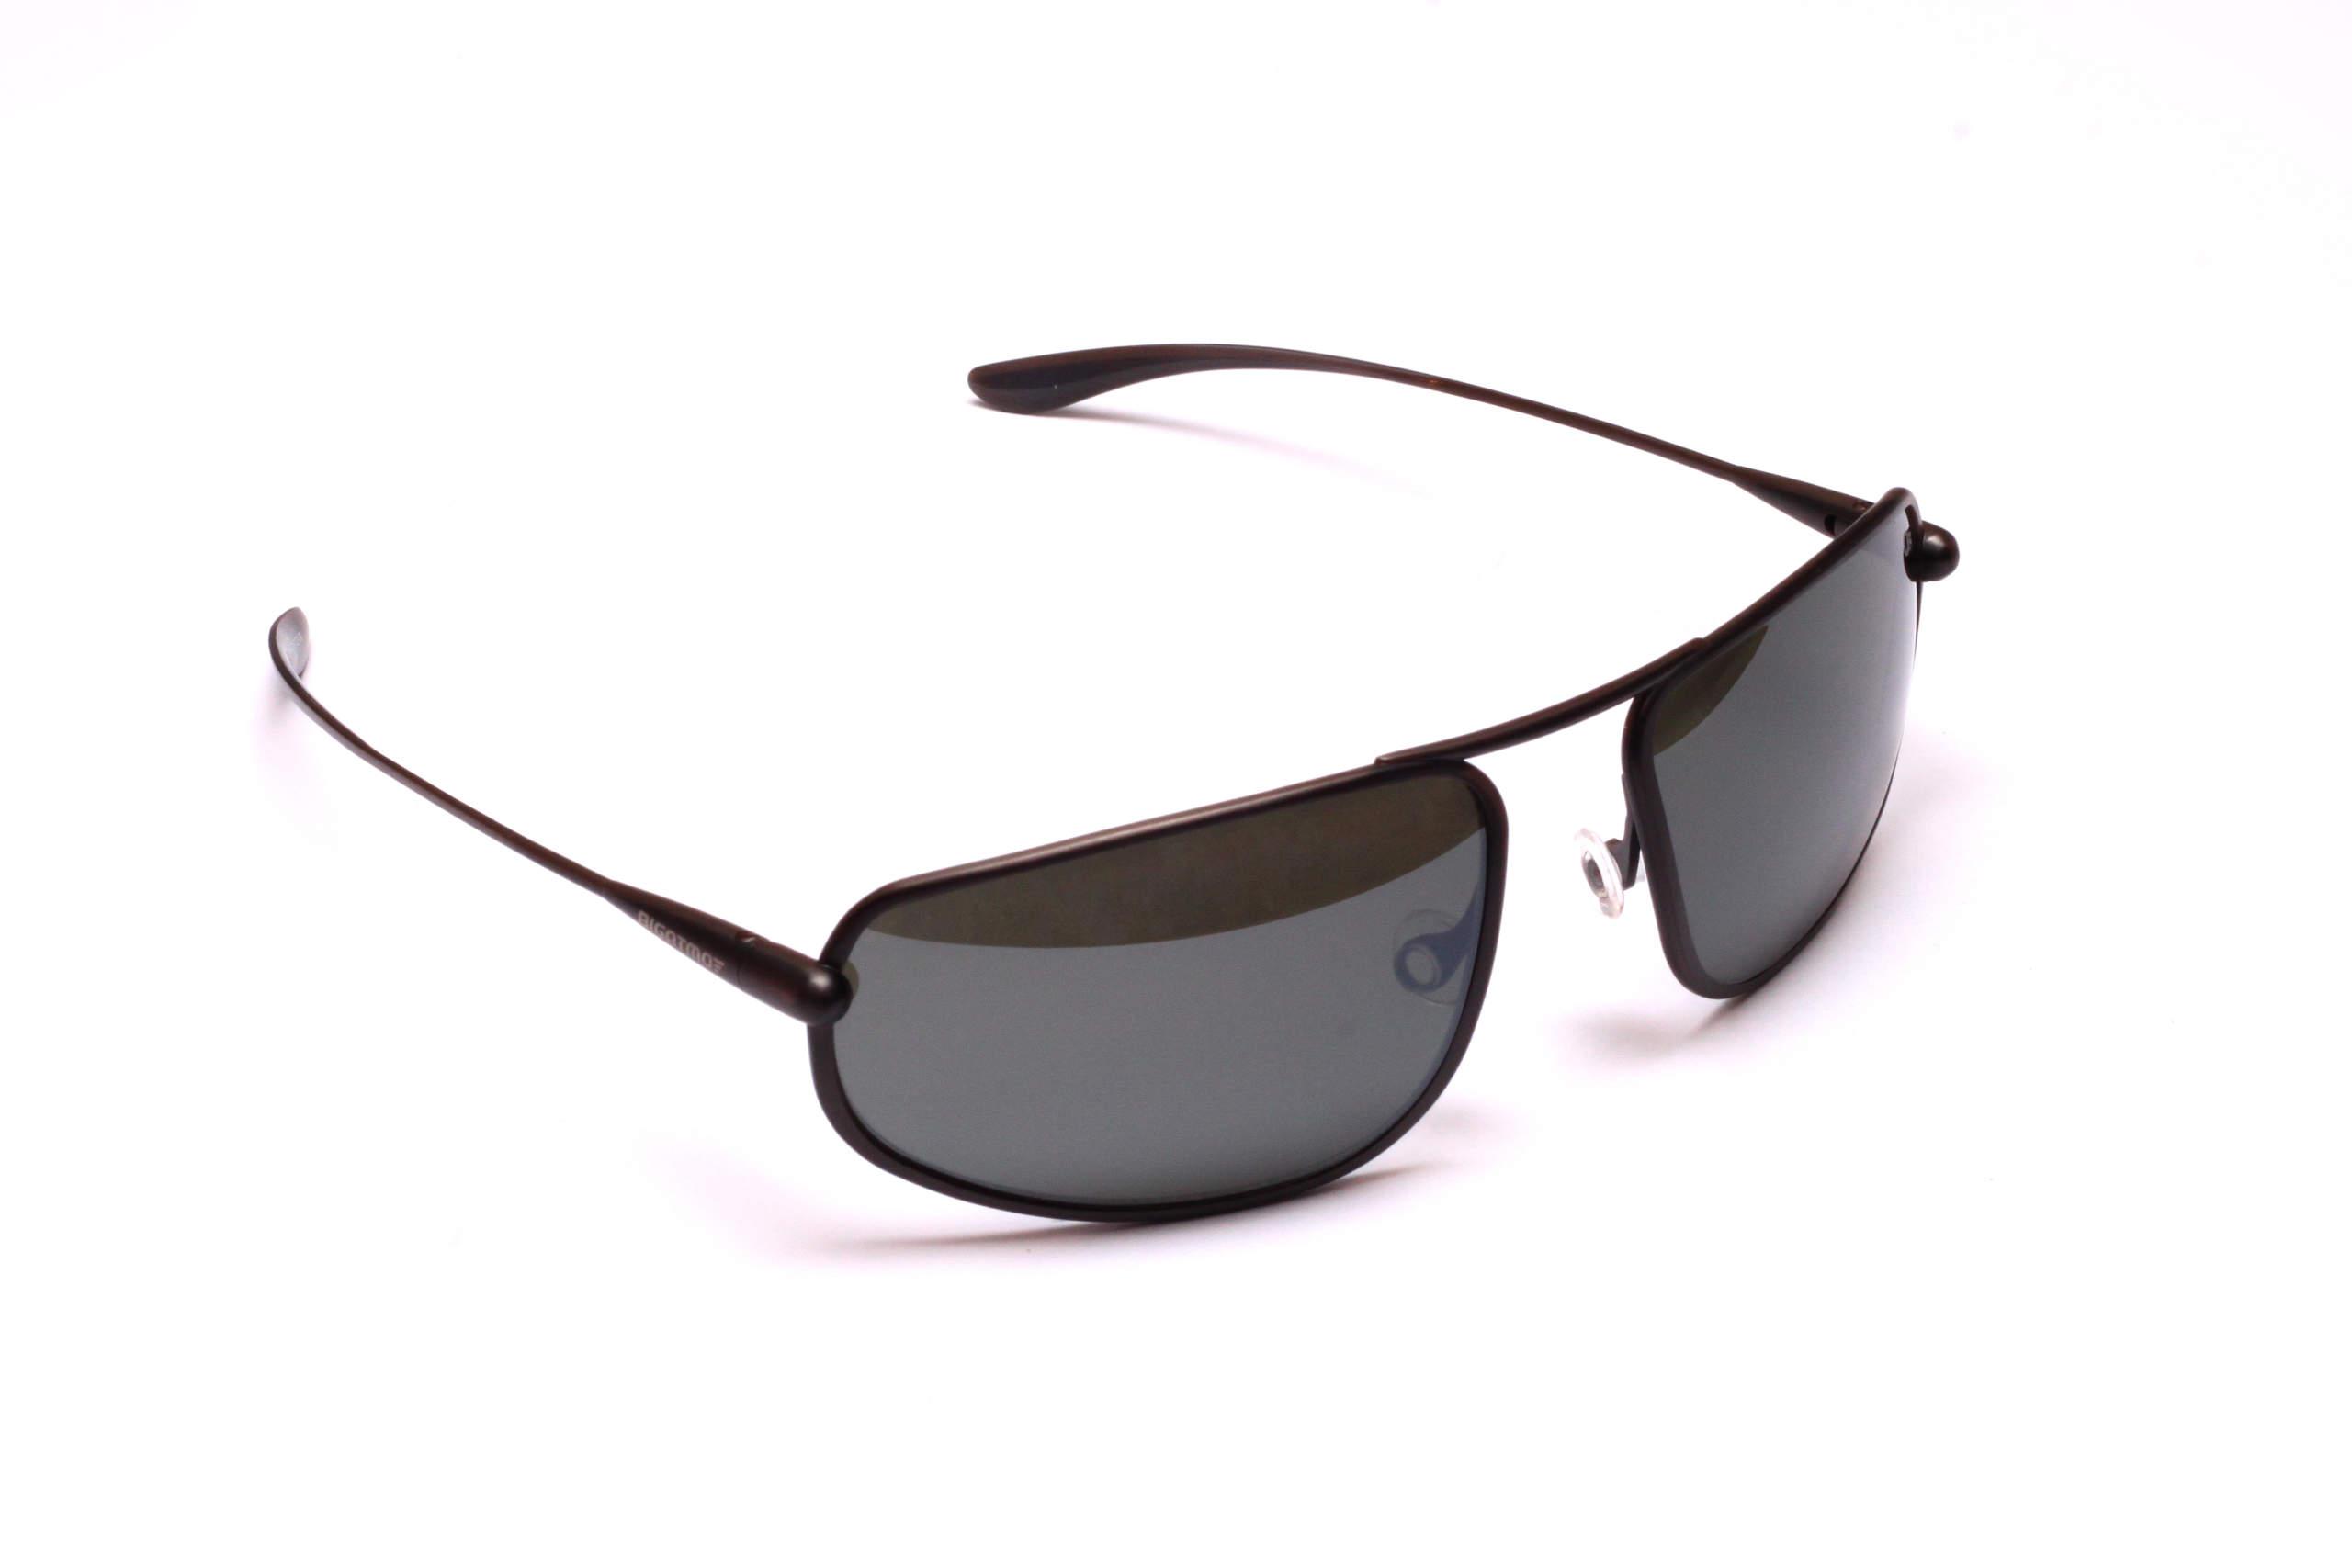 Strato - Graphite Titanium Frame Light Silver Mirror Grey Polarized Sunglasses